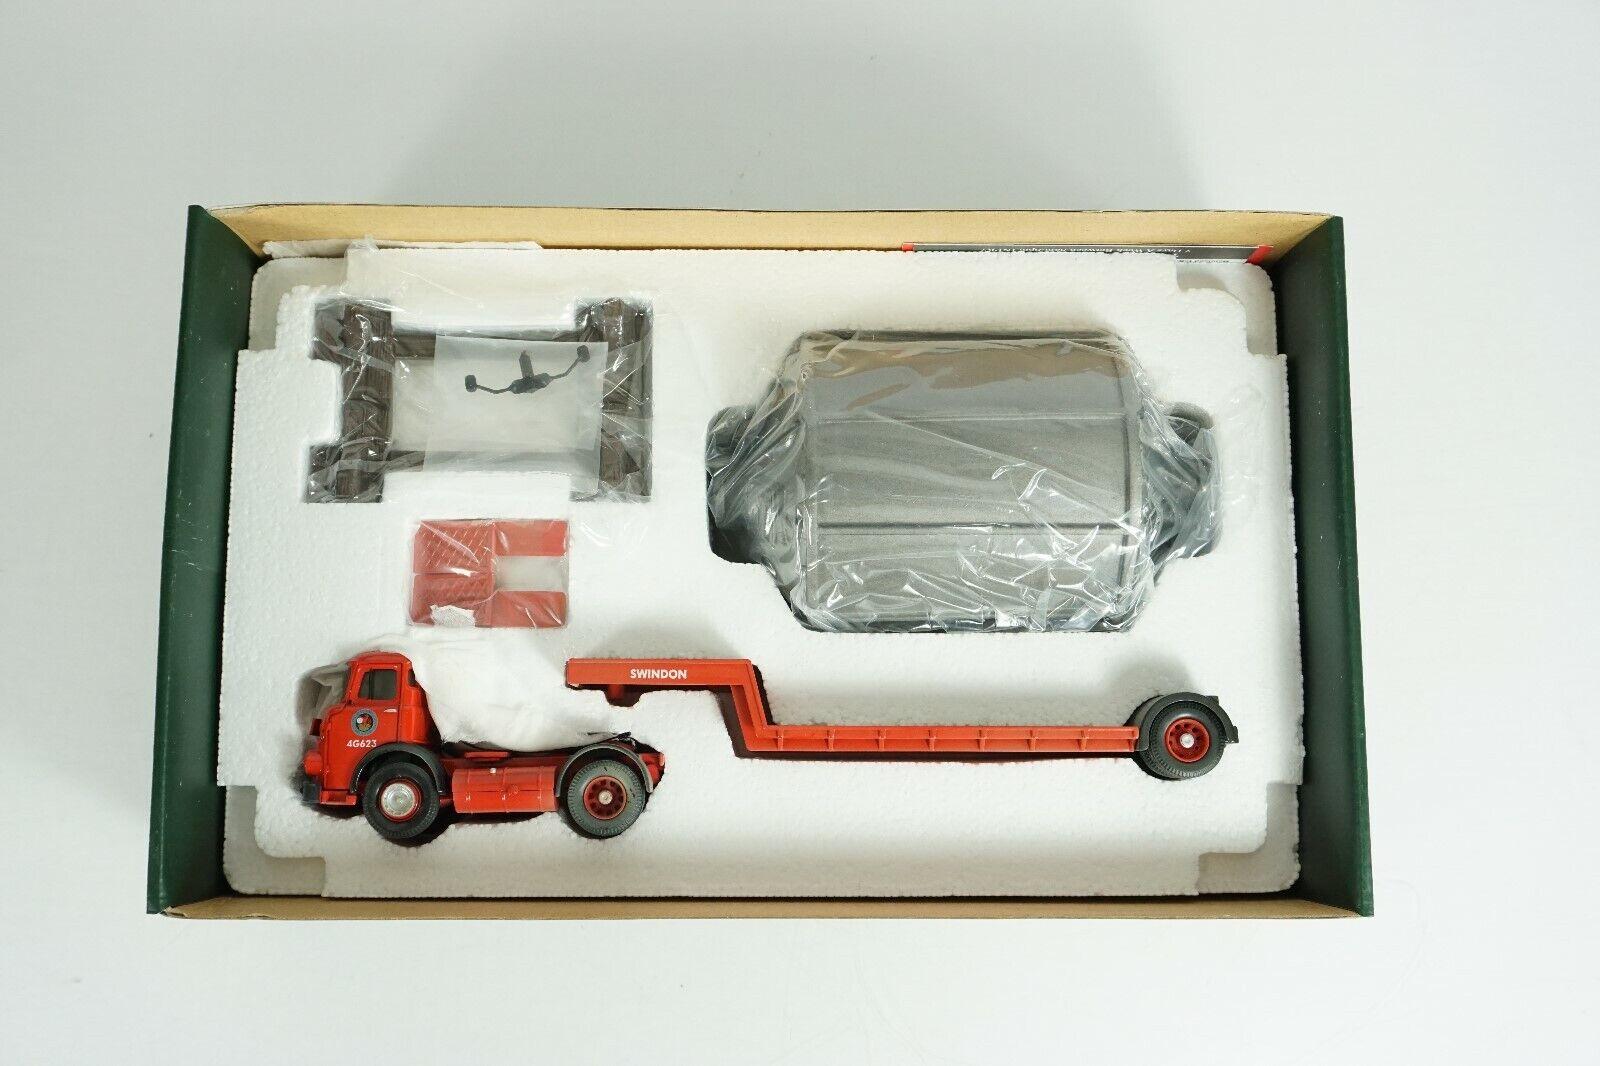 Corgi 1 50 Scale Die Cast Leyland Comet Low Loader & Load Item CC11605 New